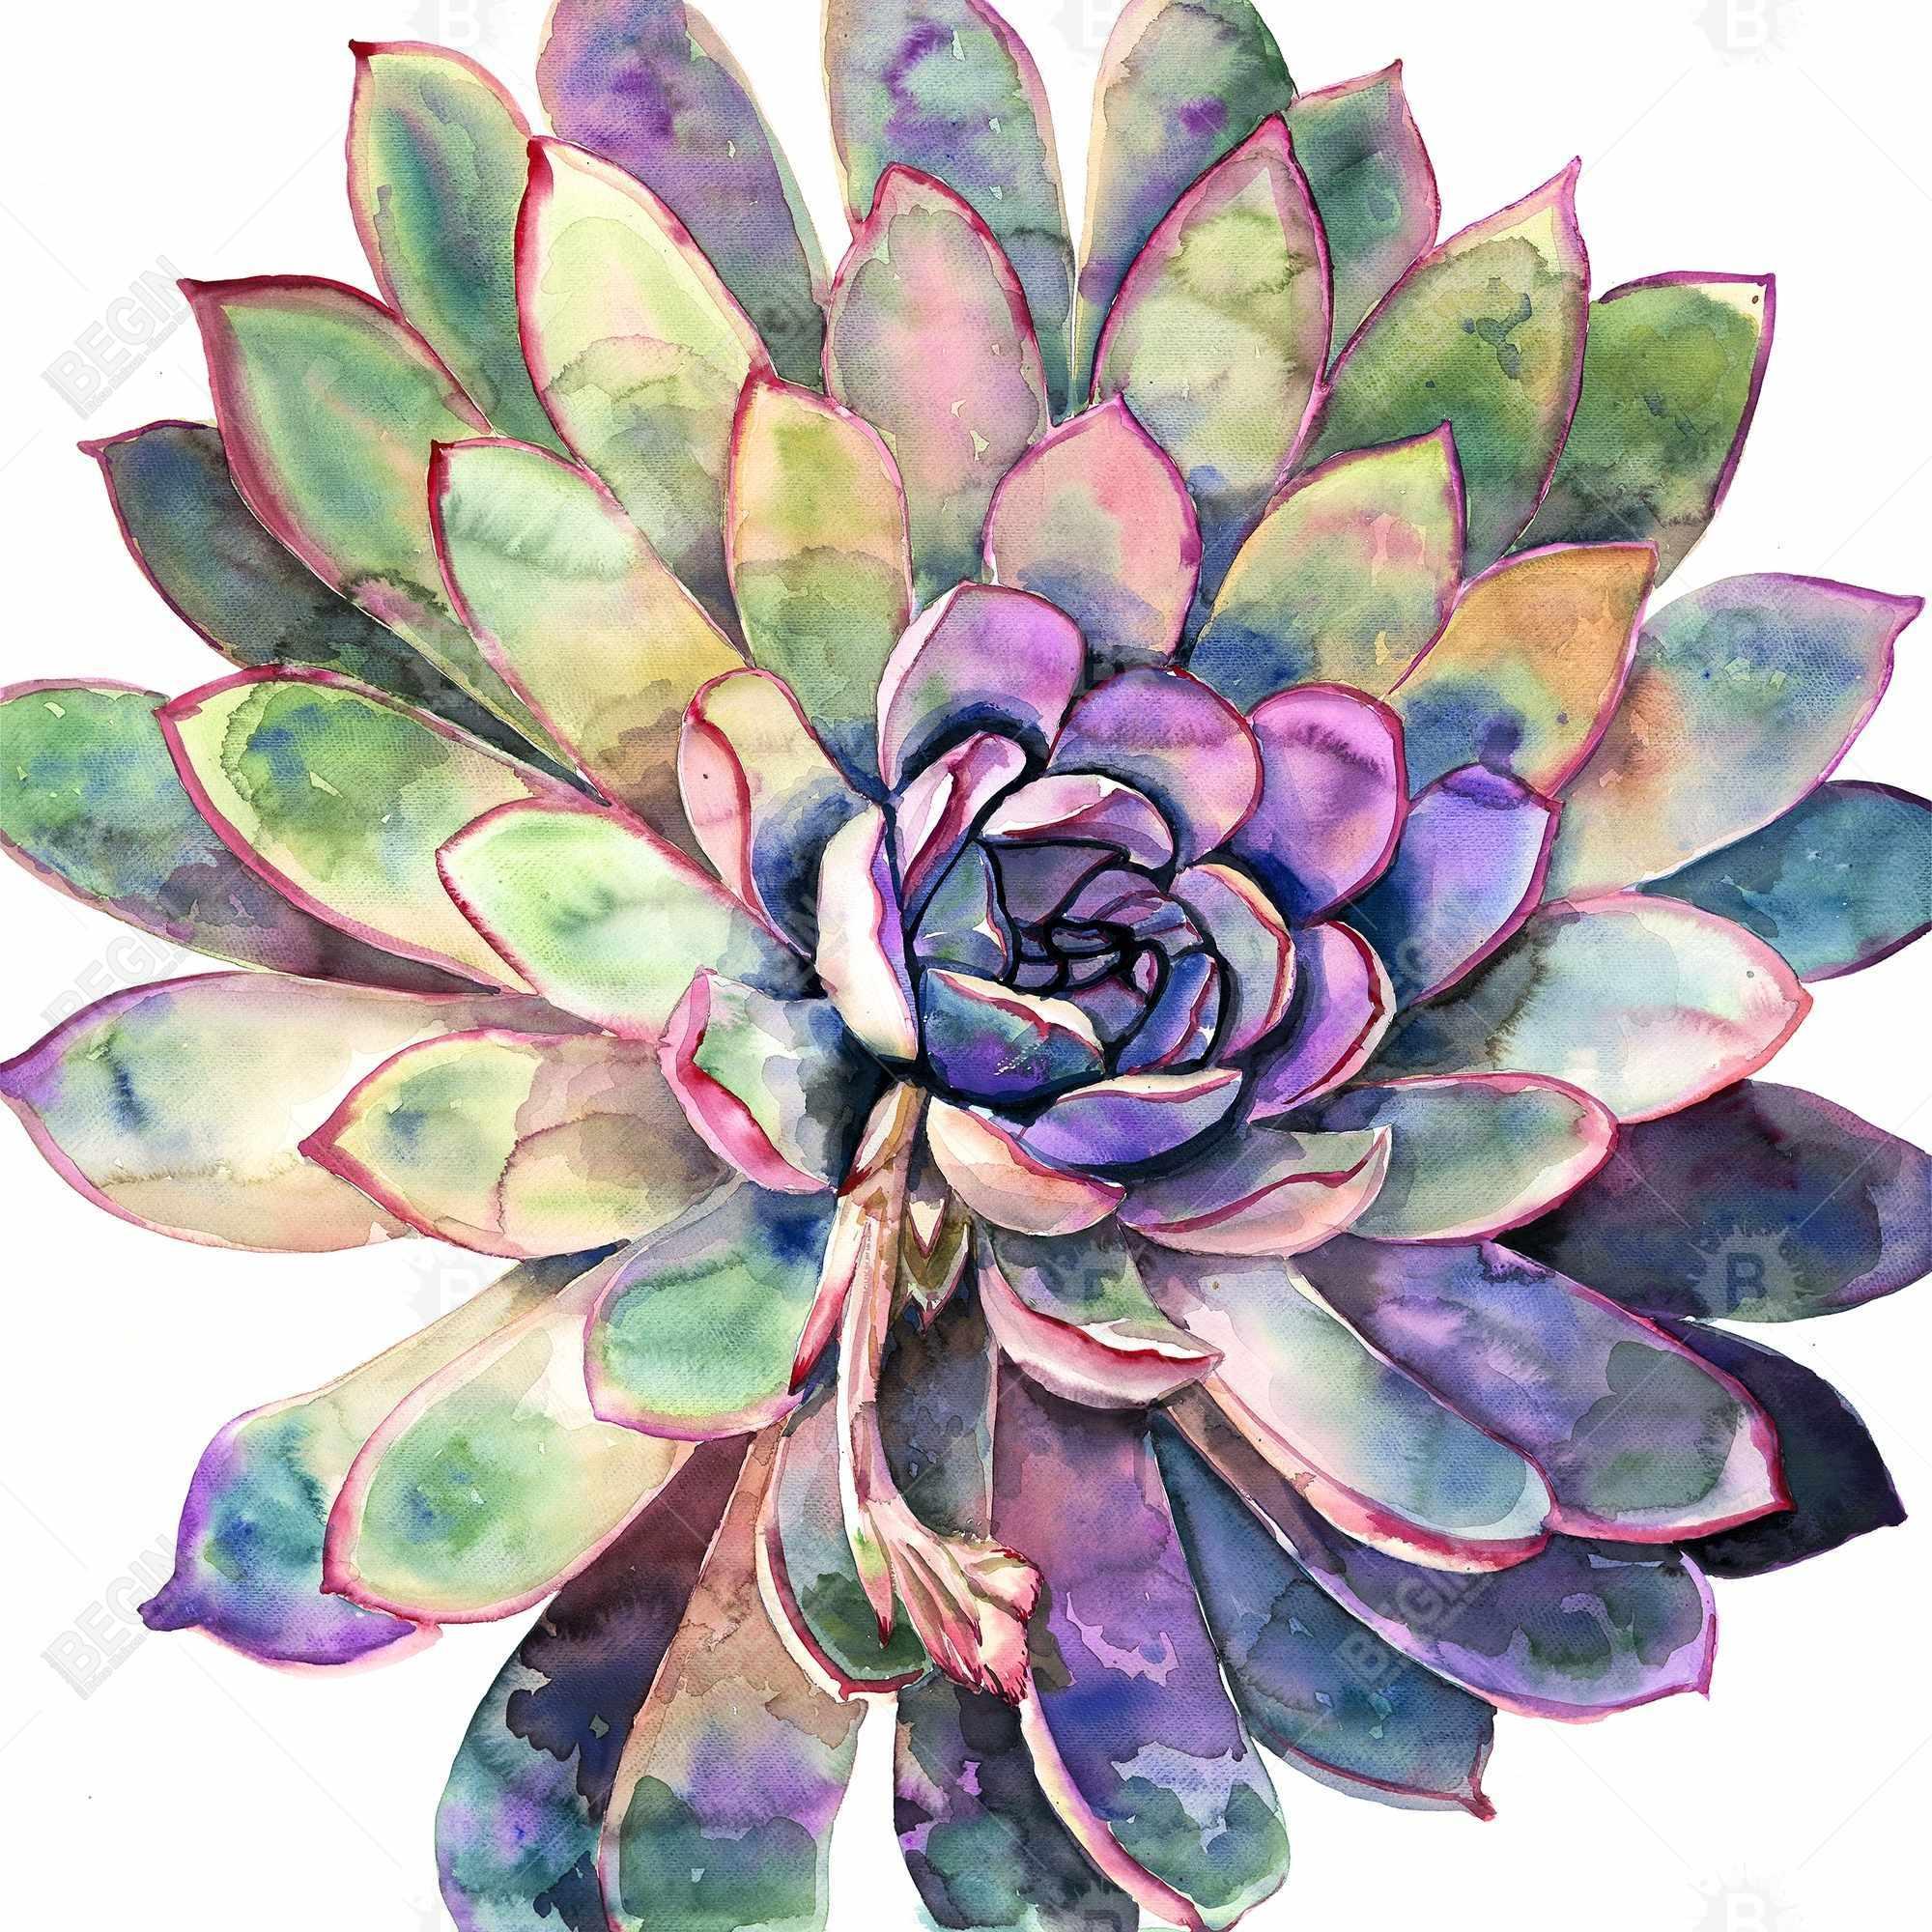 Multicolored succulent